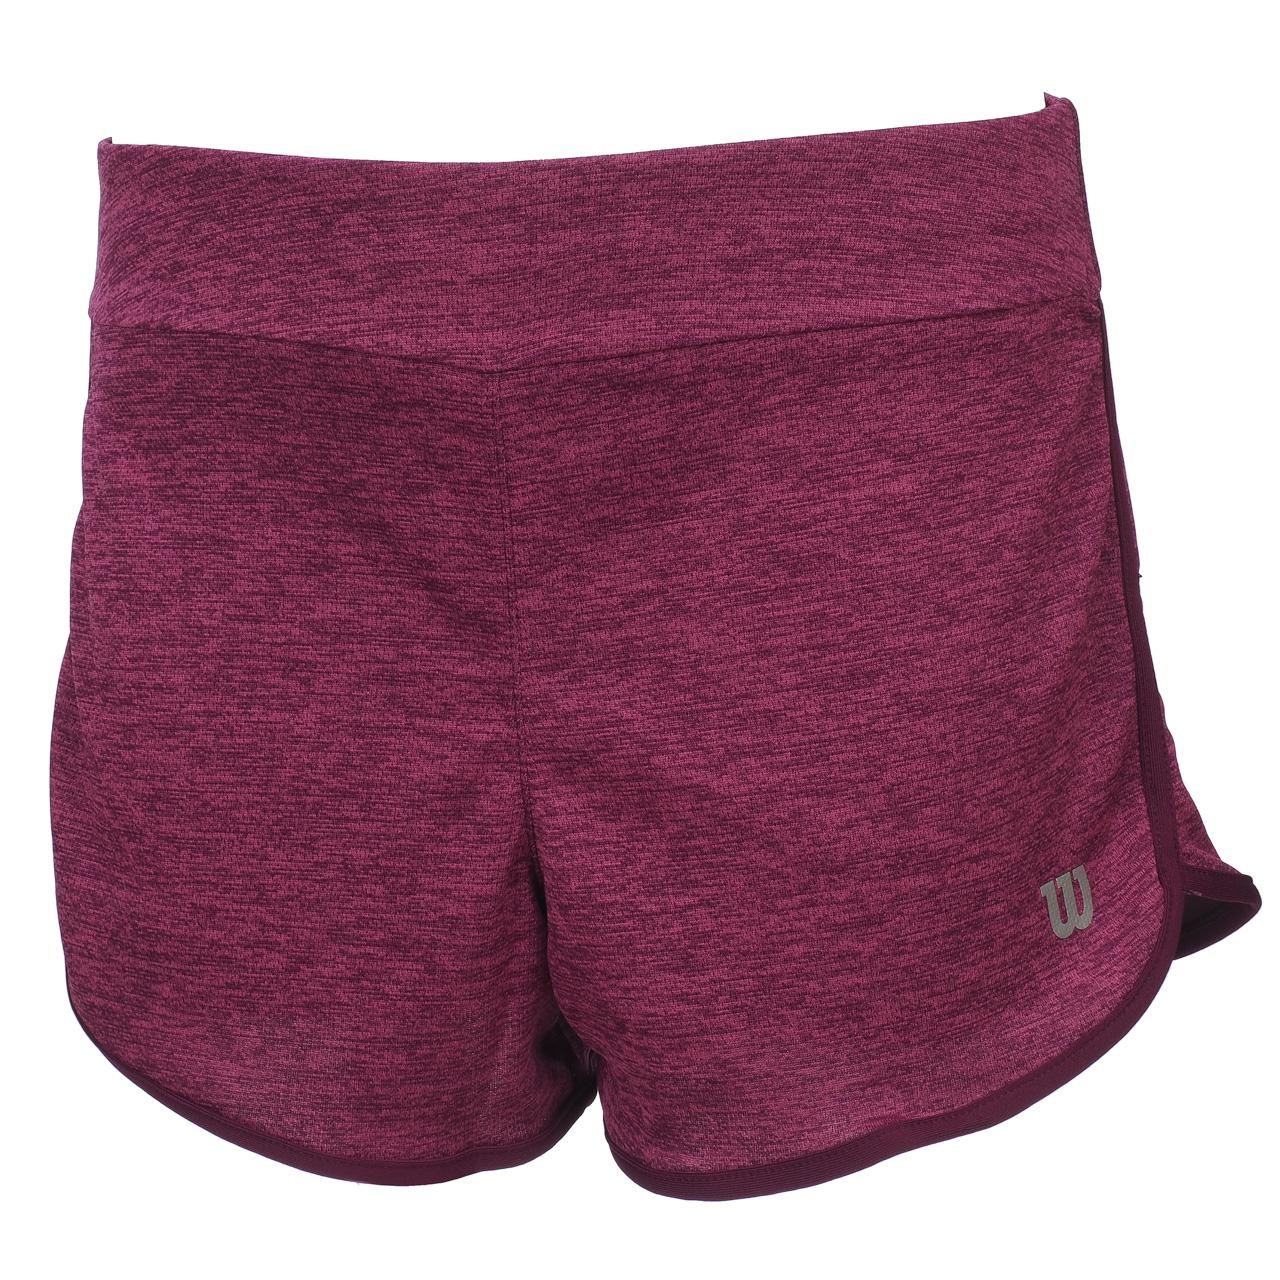 short-Tennis-Wilson-G-Core-3-5-Shorts-Maedchen-Lila-90184-Neu